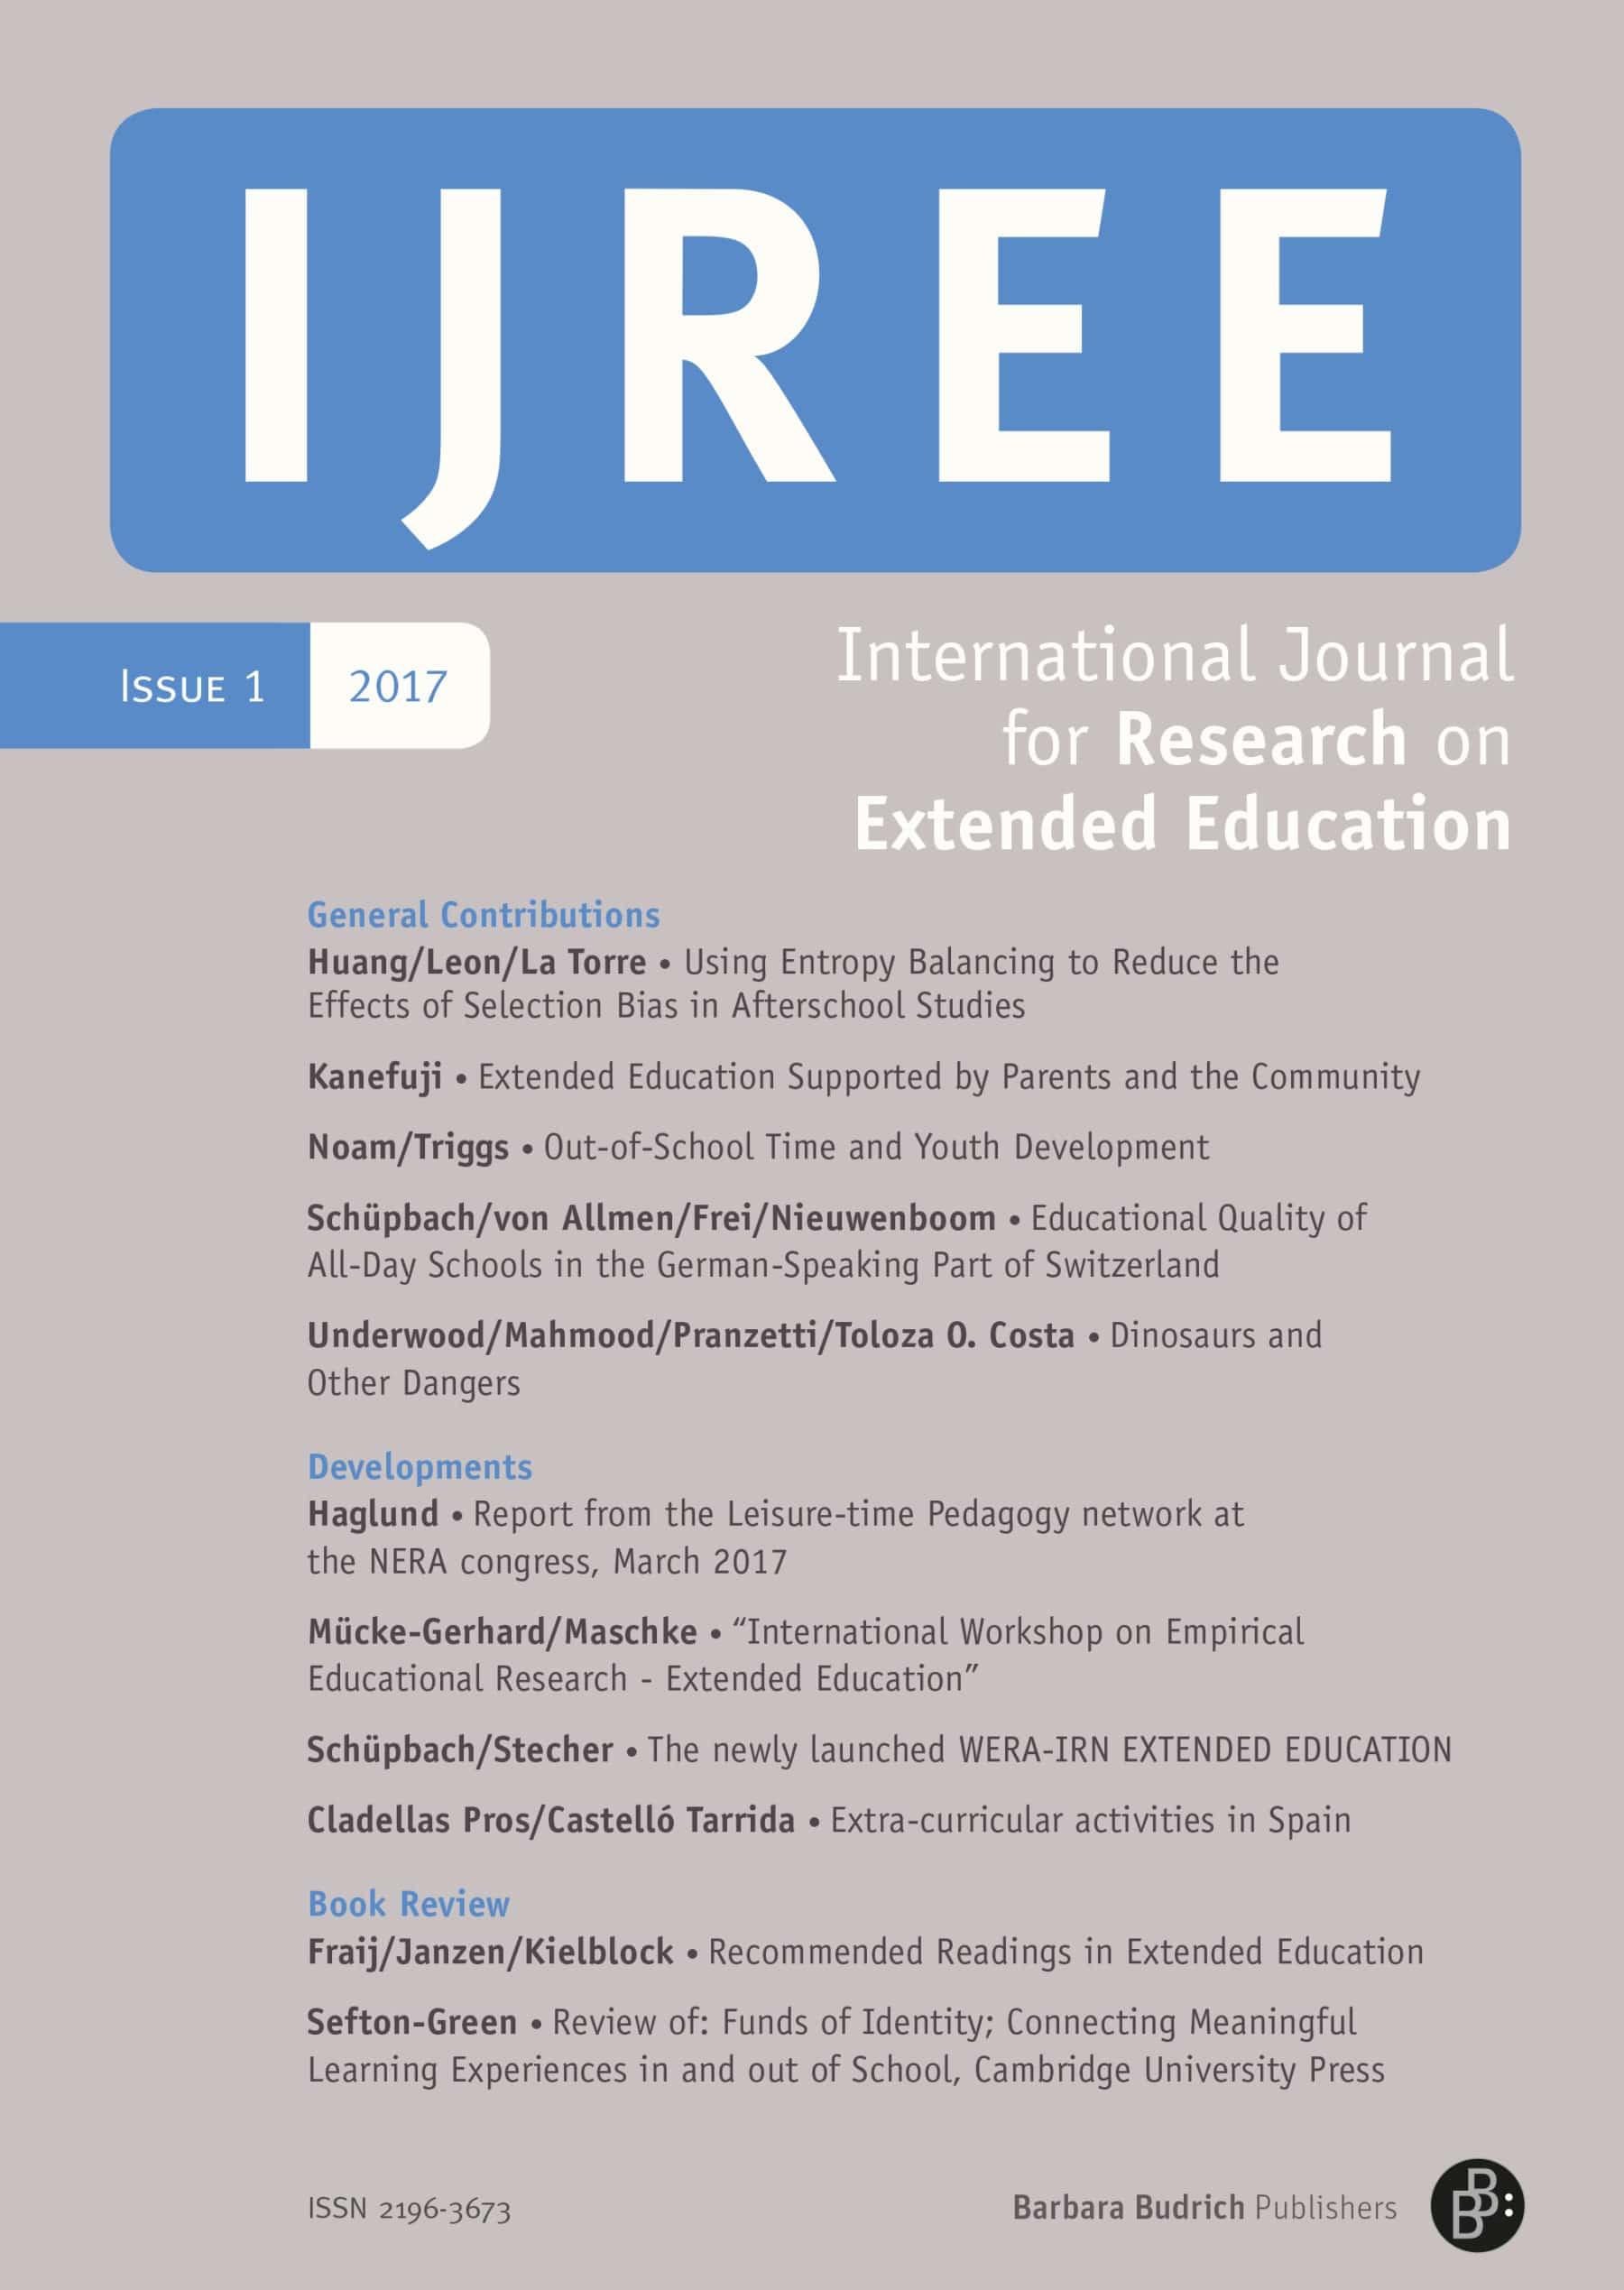 IJREE 1-2017 | Free Contributions